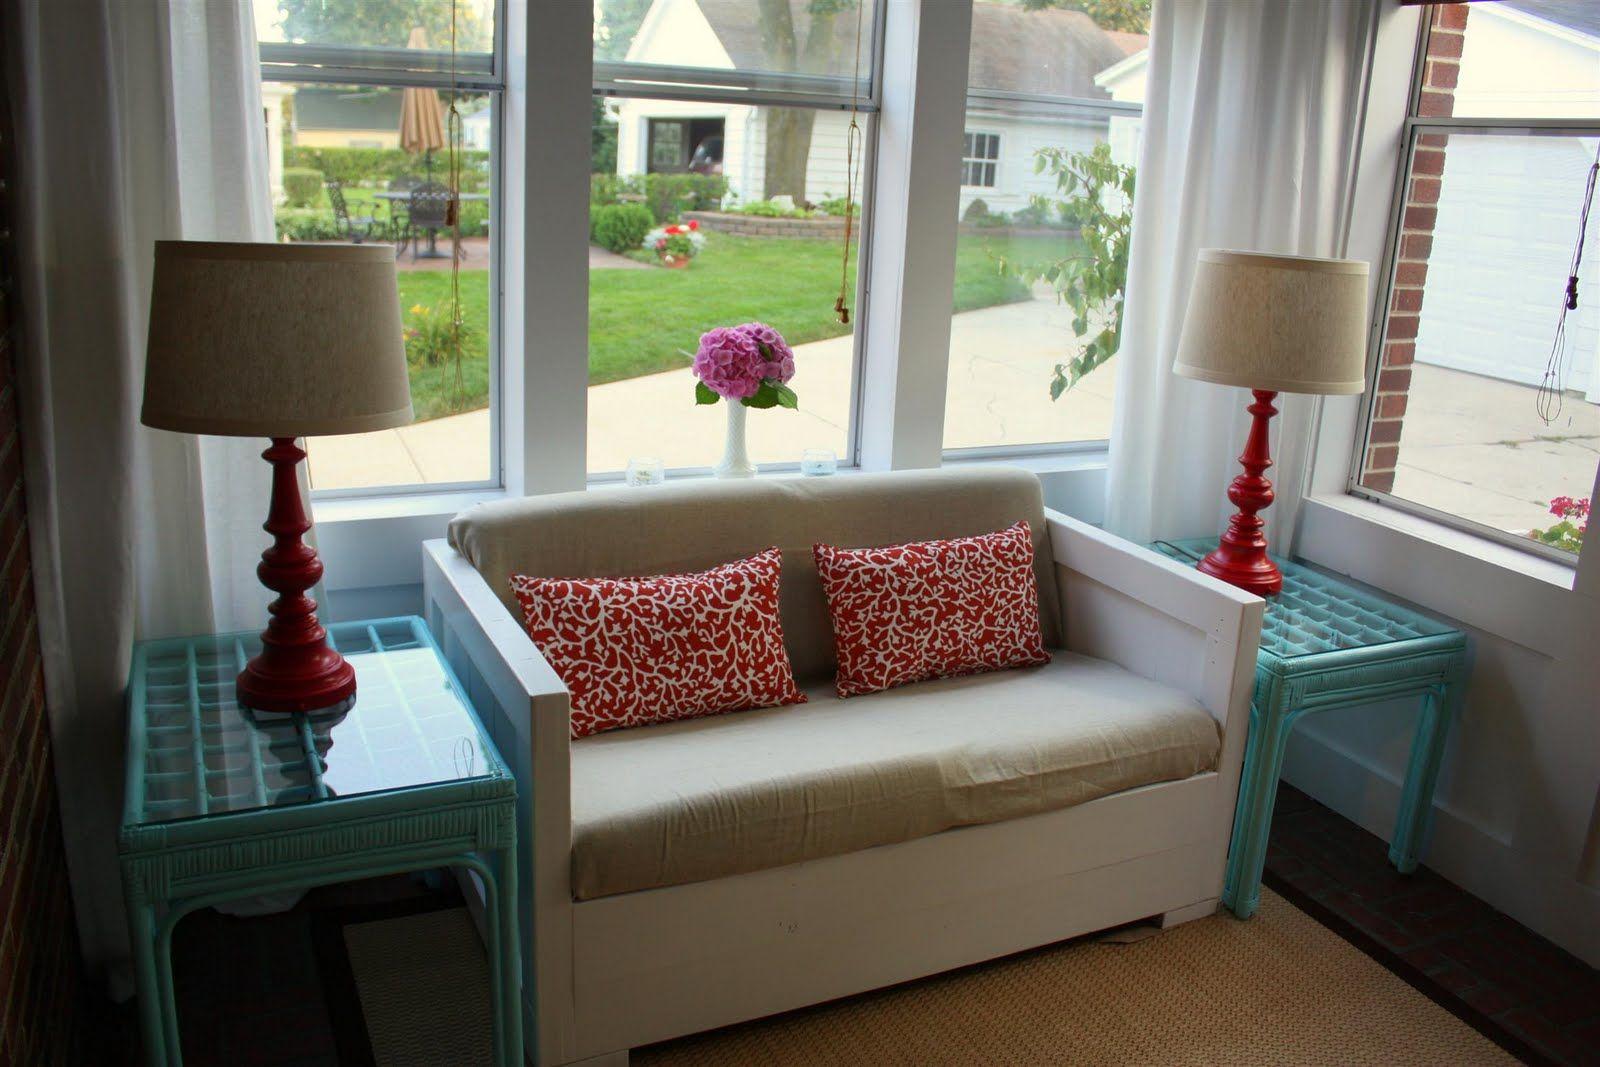 Enjoyable White Washed This End Up Loveseat Home In 2019 Furniture Inzonedesignstudio Interior Chair Design Inzonedesignstudiocom